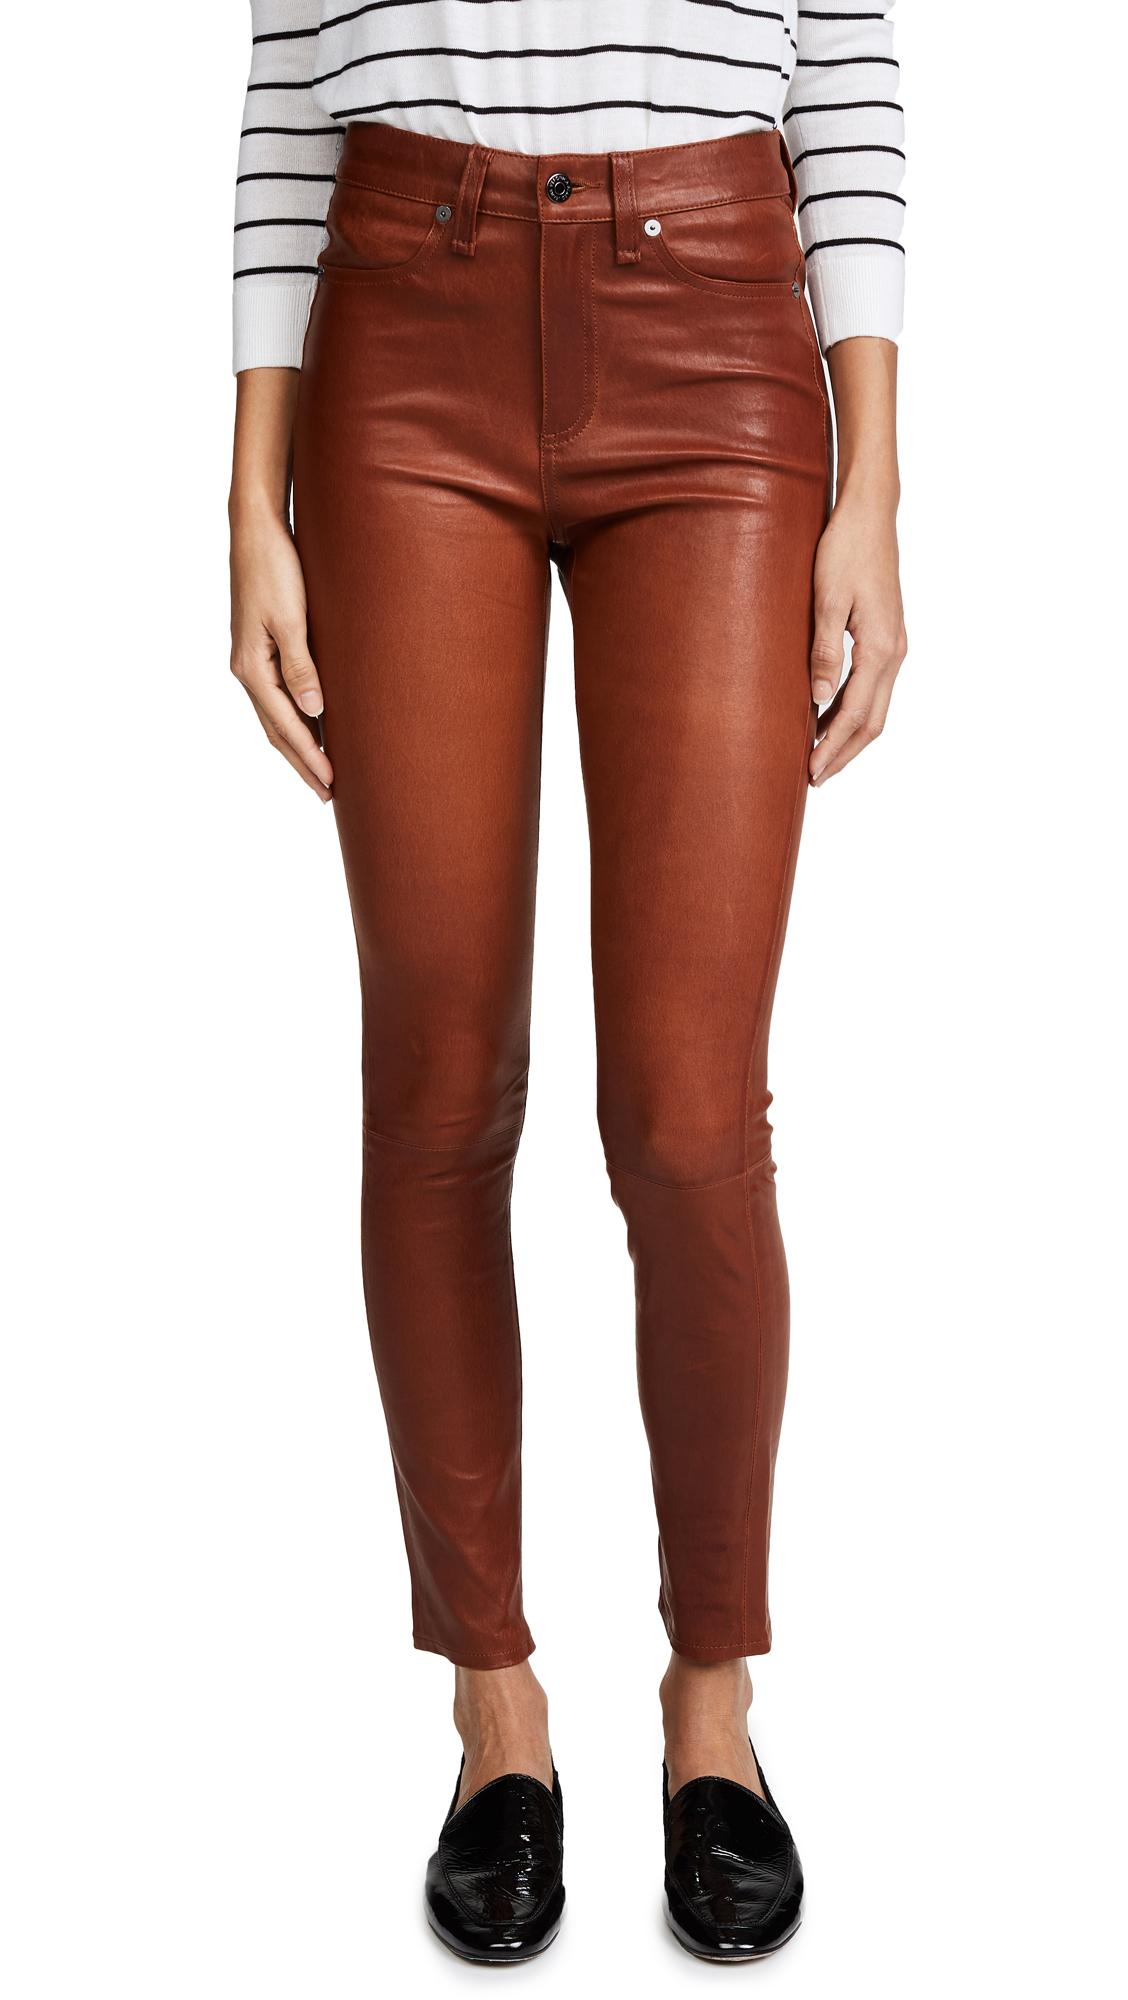 Veronica Beard Jean Kate Skinny Leather Pants - Cognac